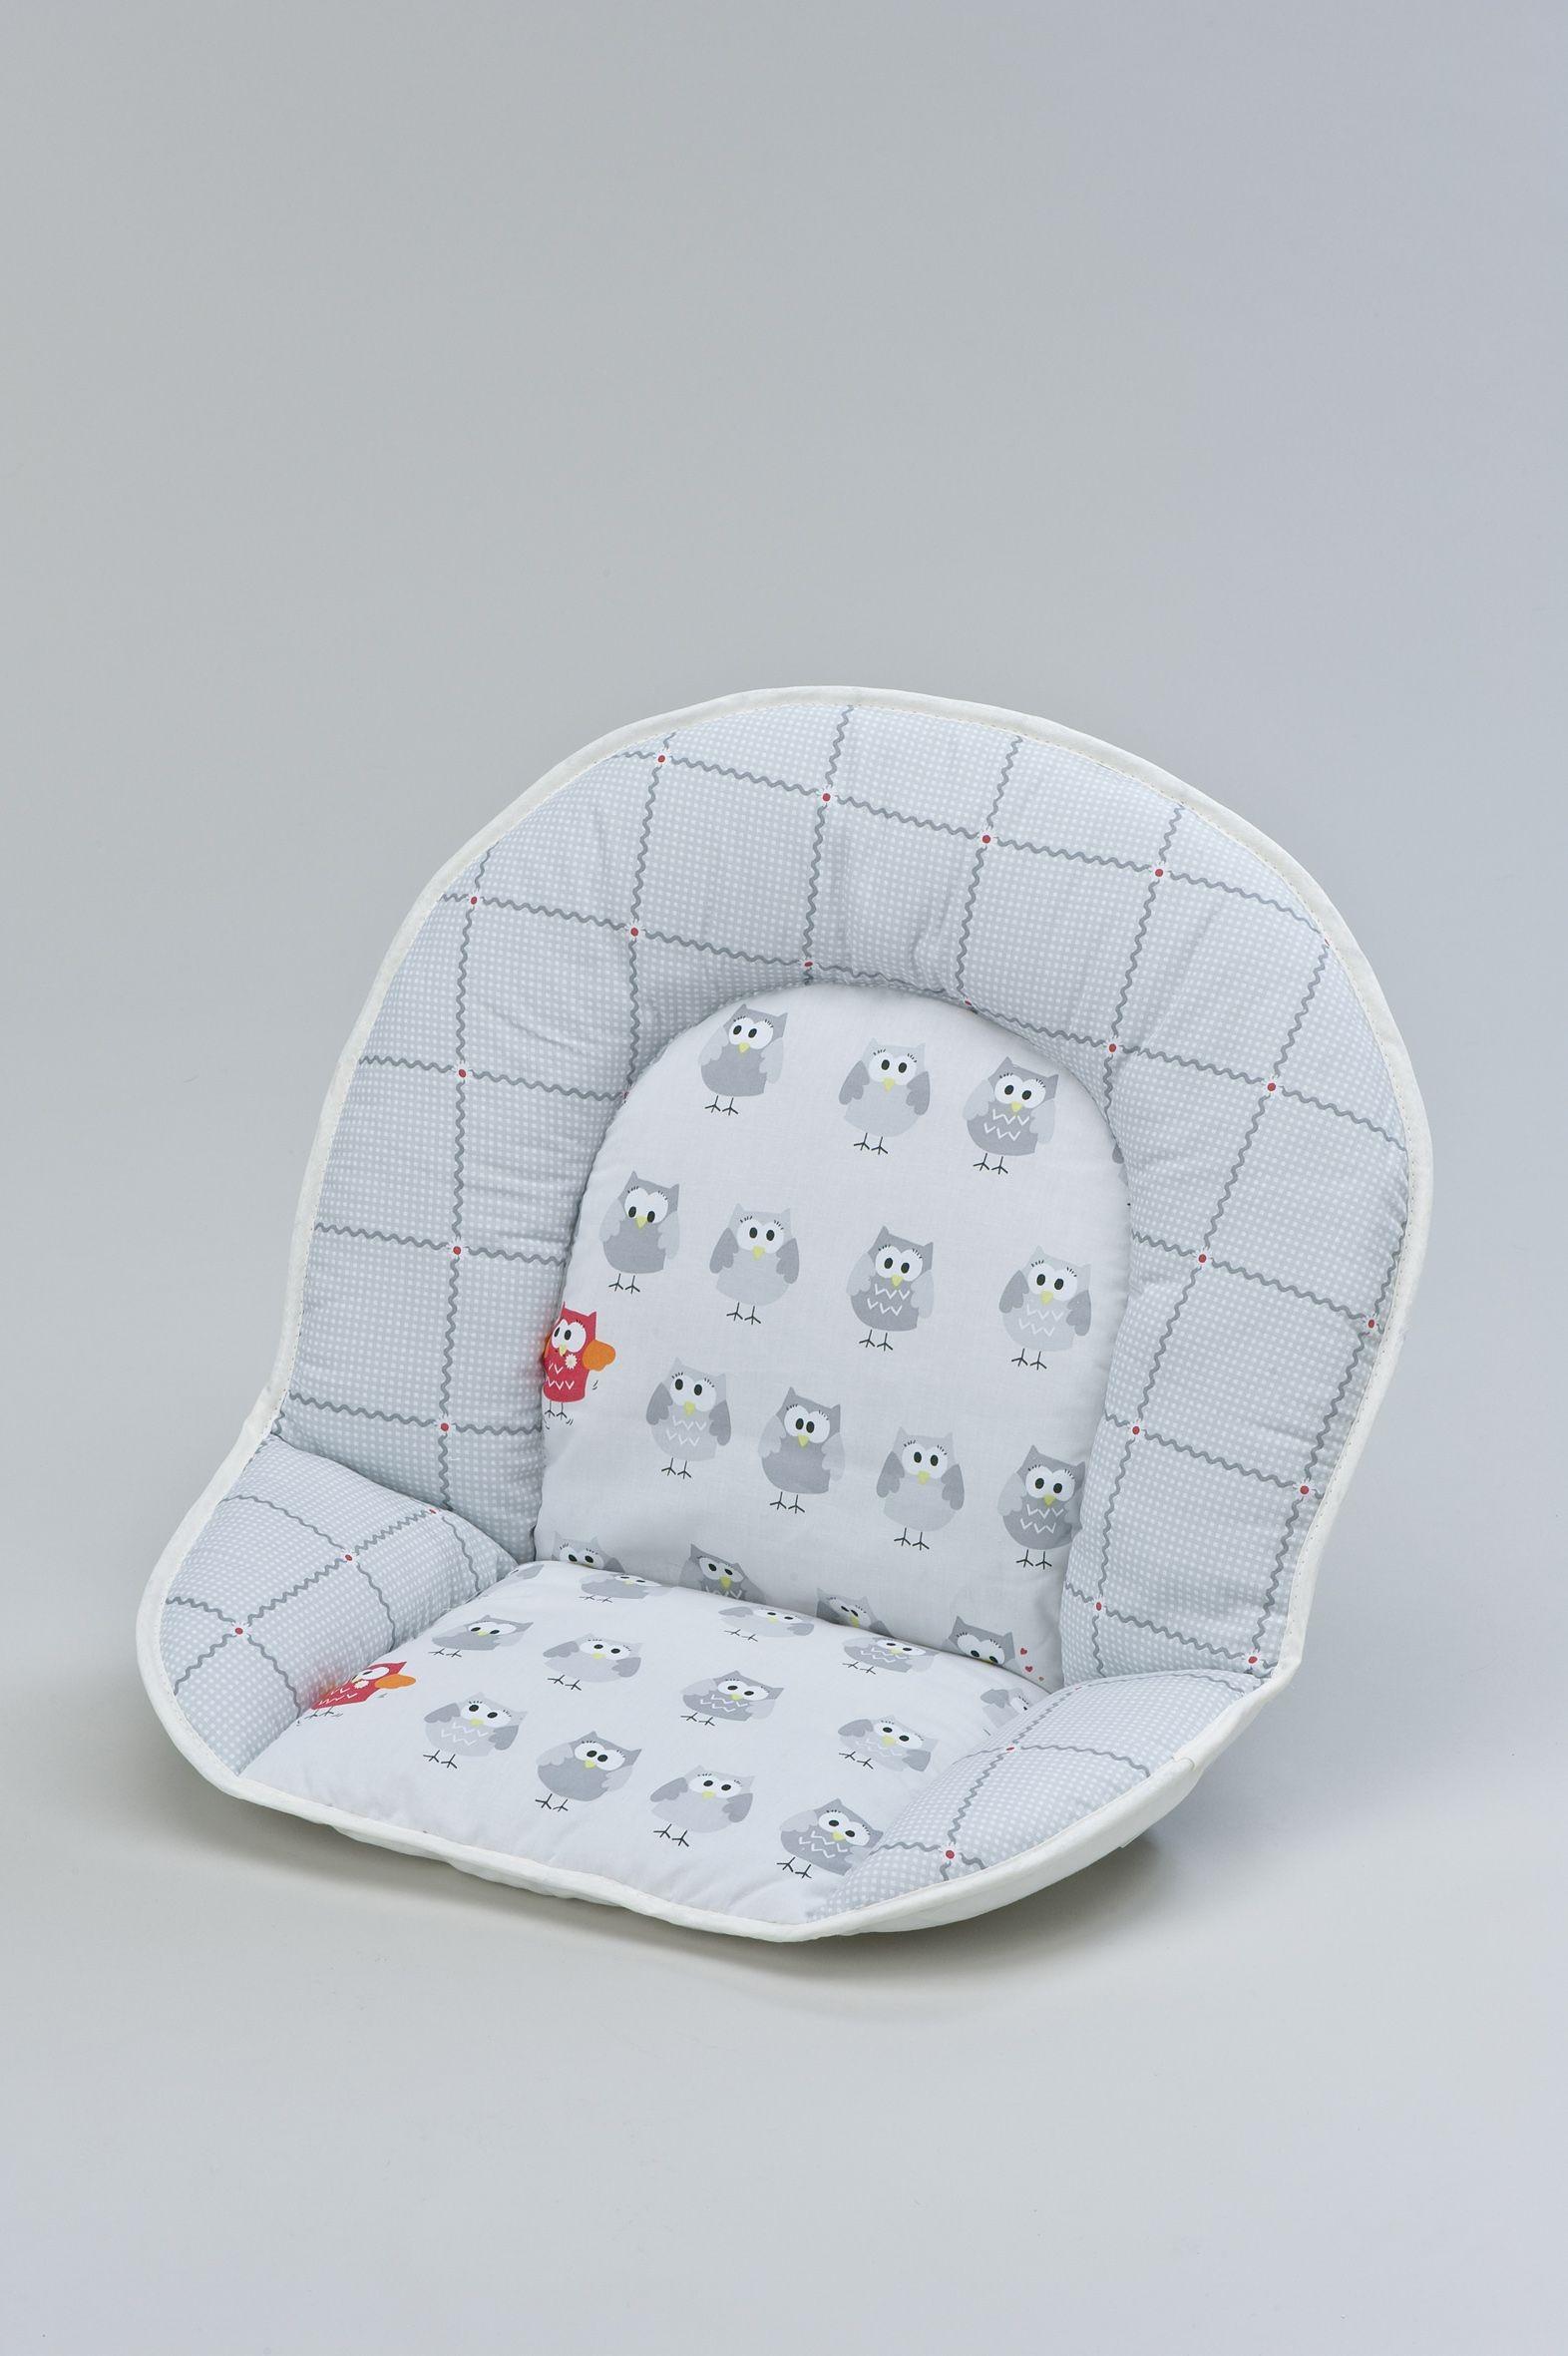 Geuther Family Sitzverkleinerer 4737 Farbe 105